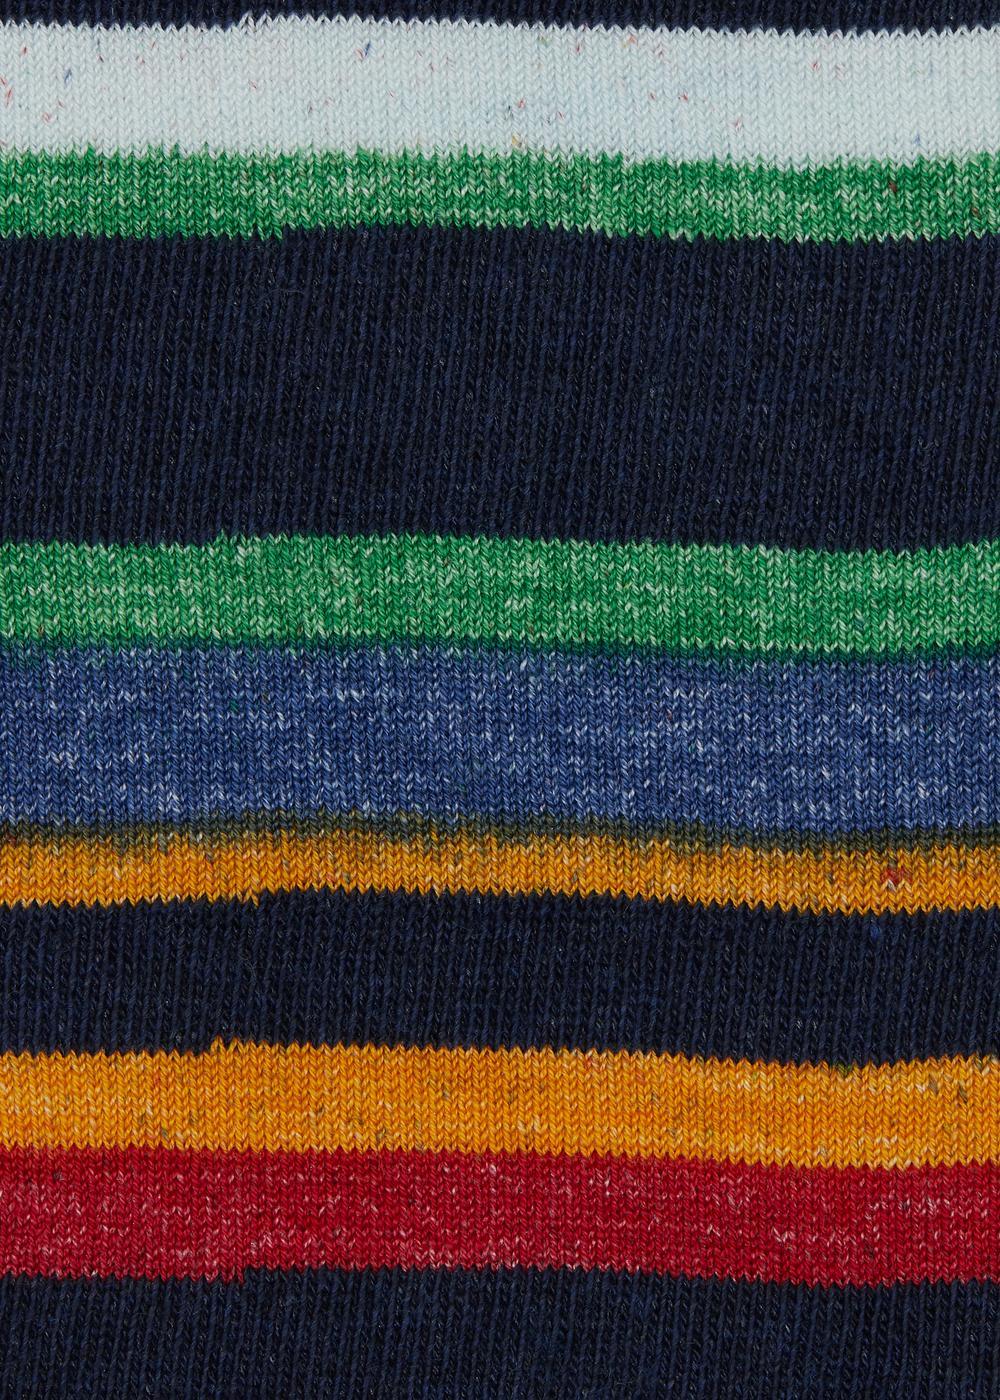 Long patterned cotton socks